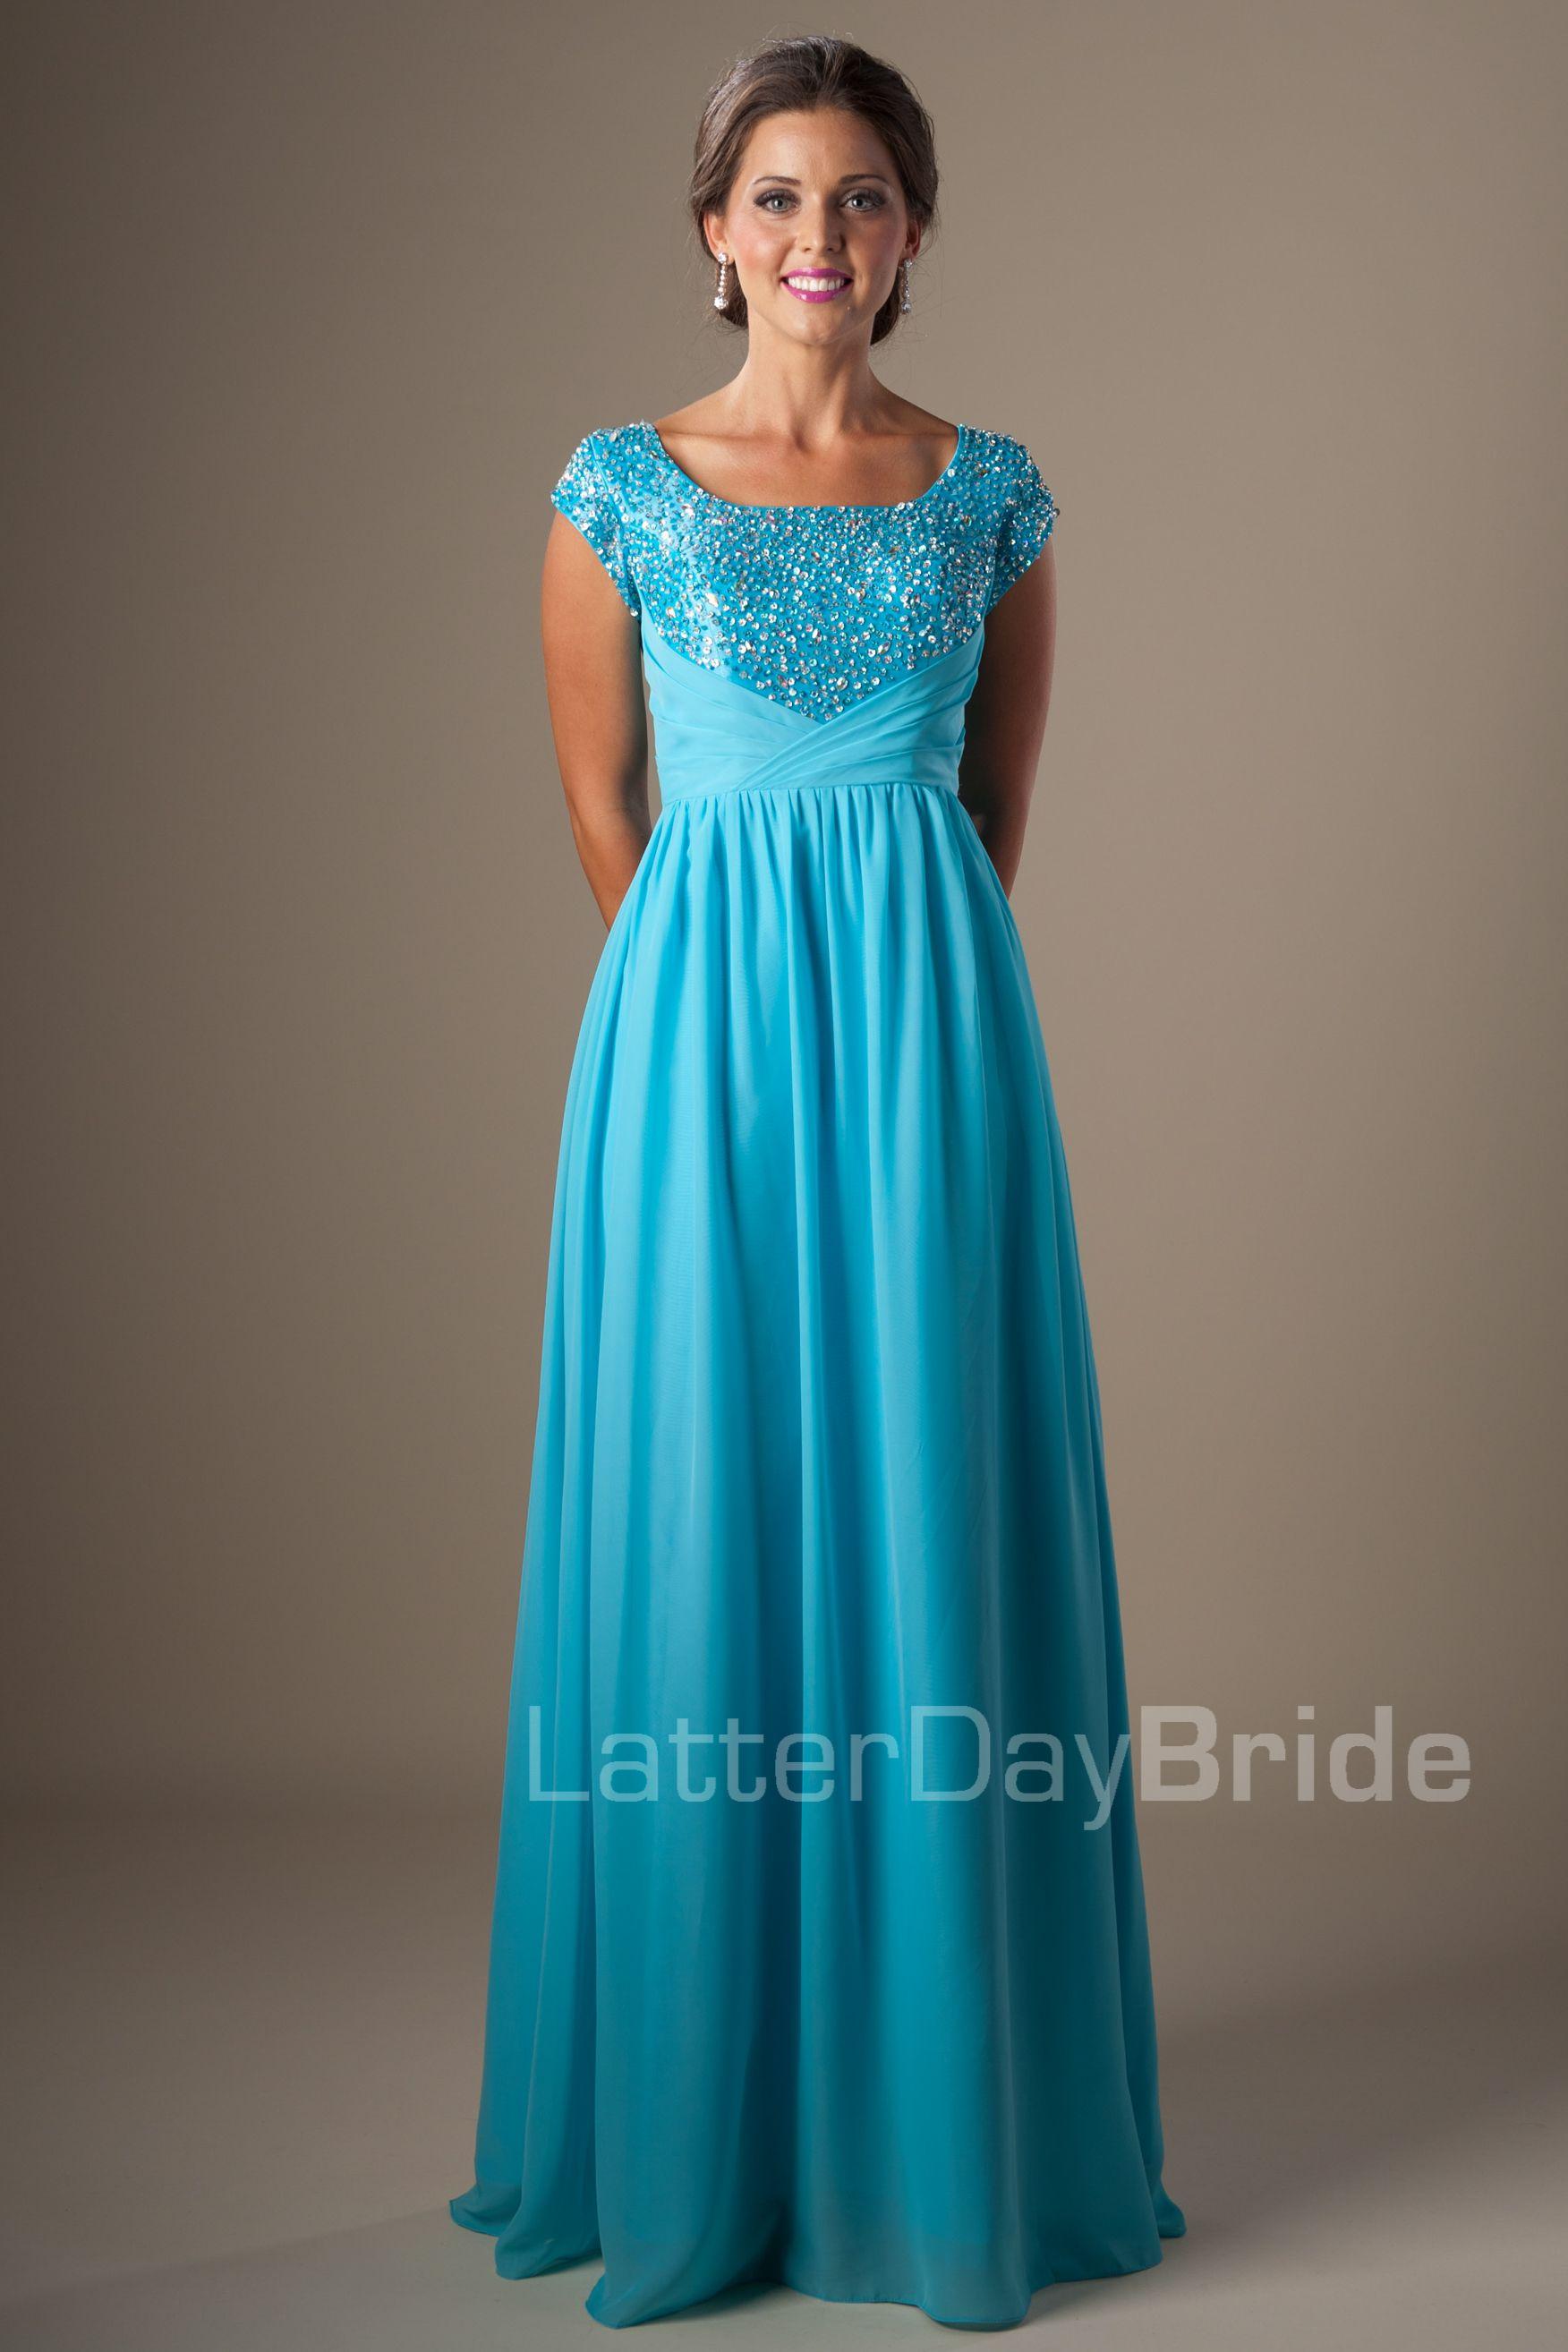 Modest Prom Dresses : Sydney | Modest Prom Dresses | Pinterest ...